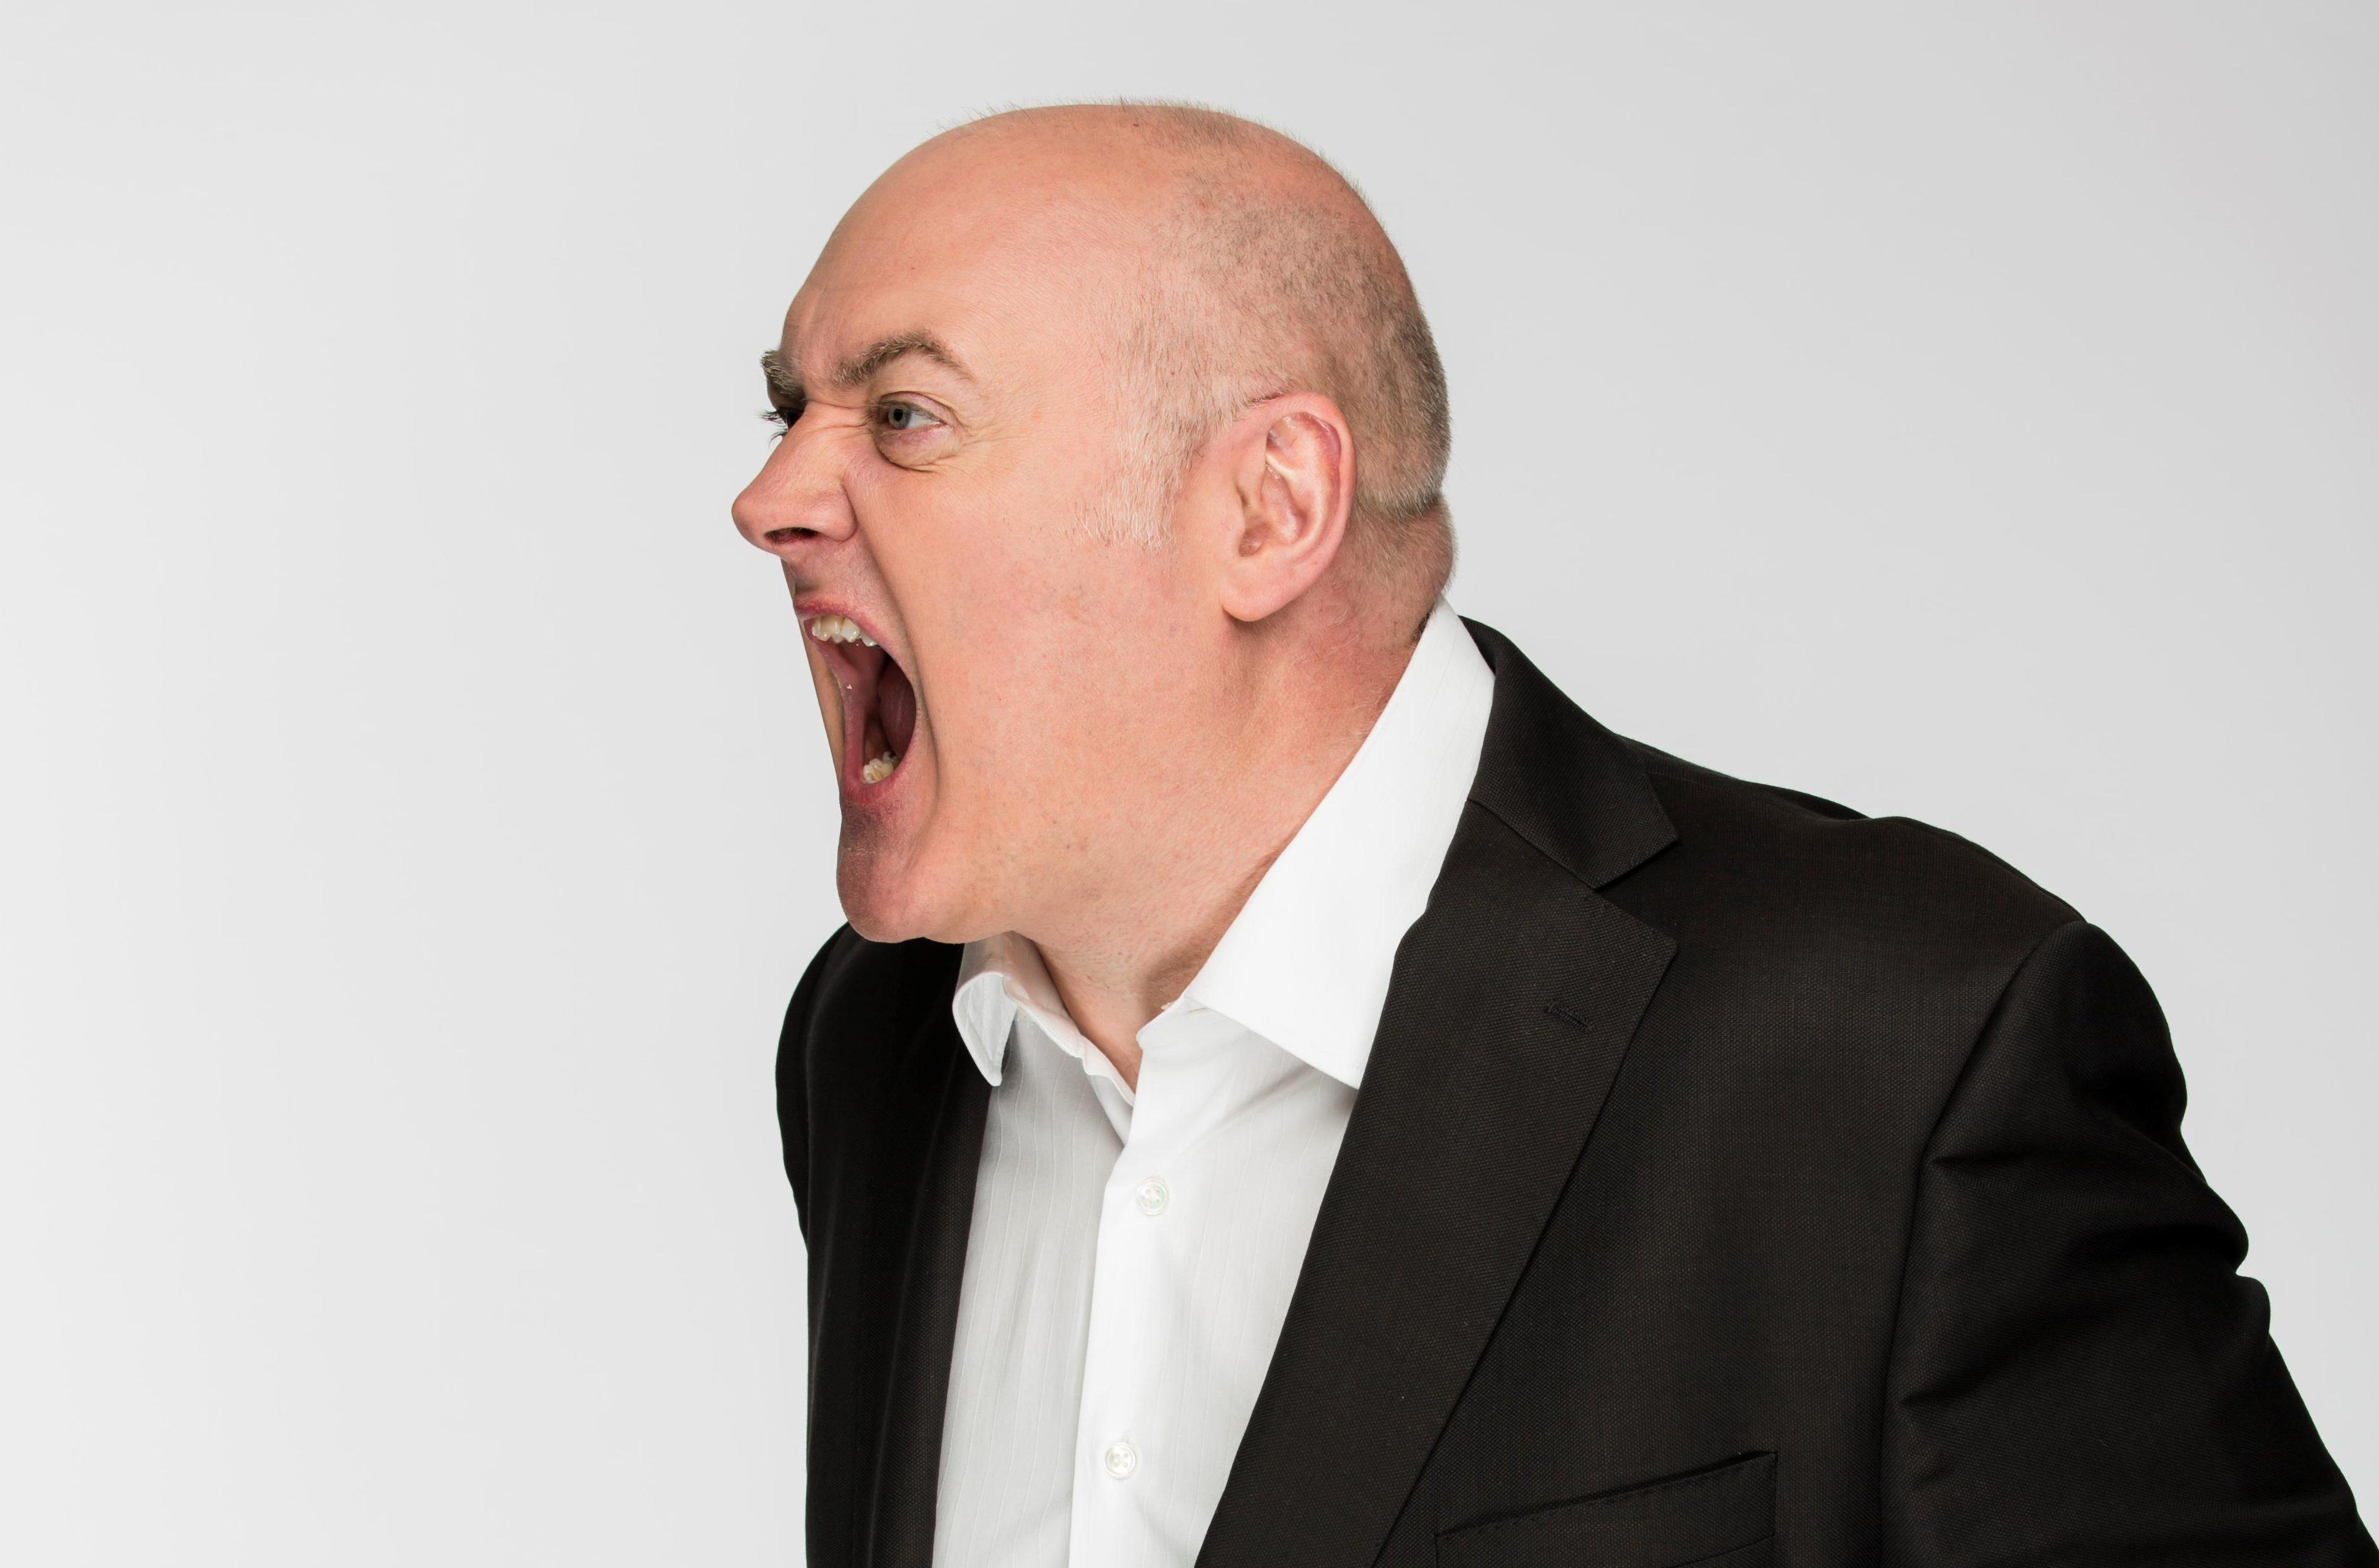 Dara is bringing his show to Edinburgh's Playhouse (Brian Ritchie)